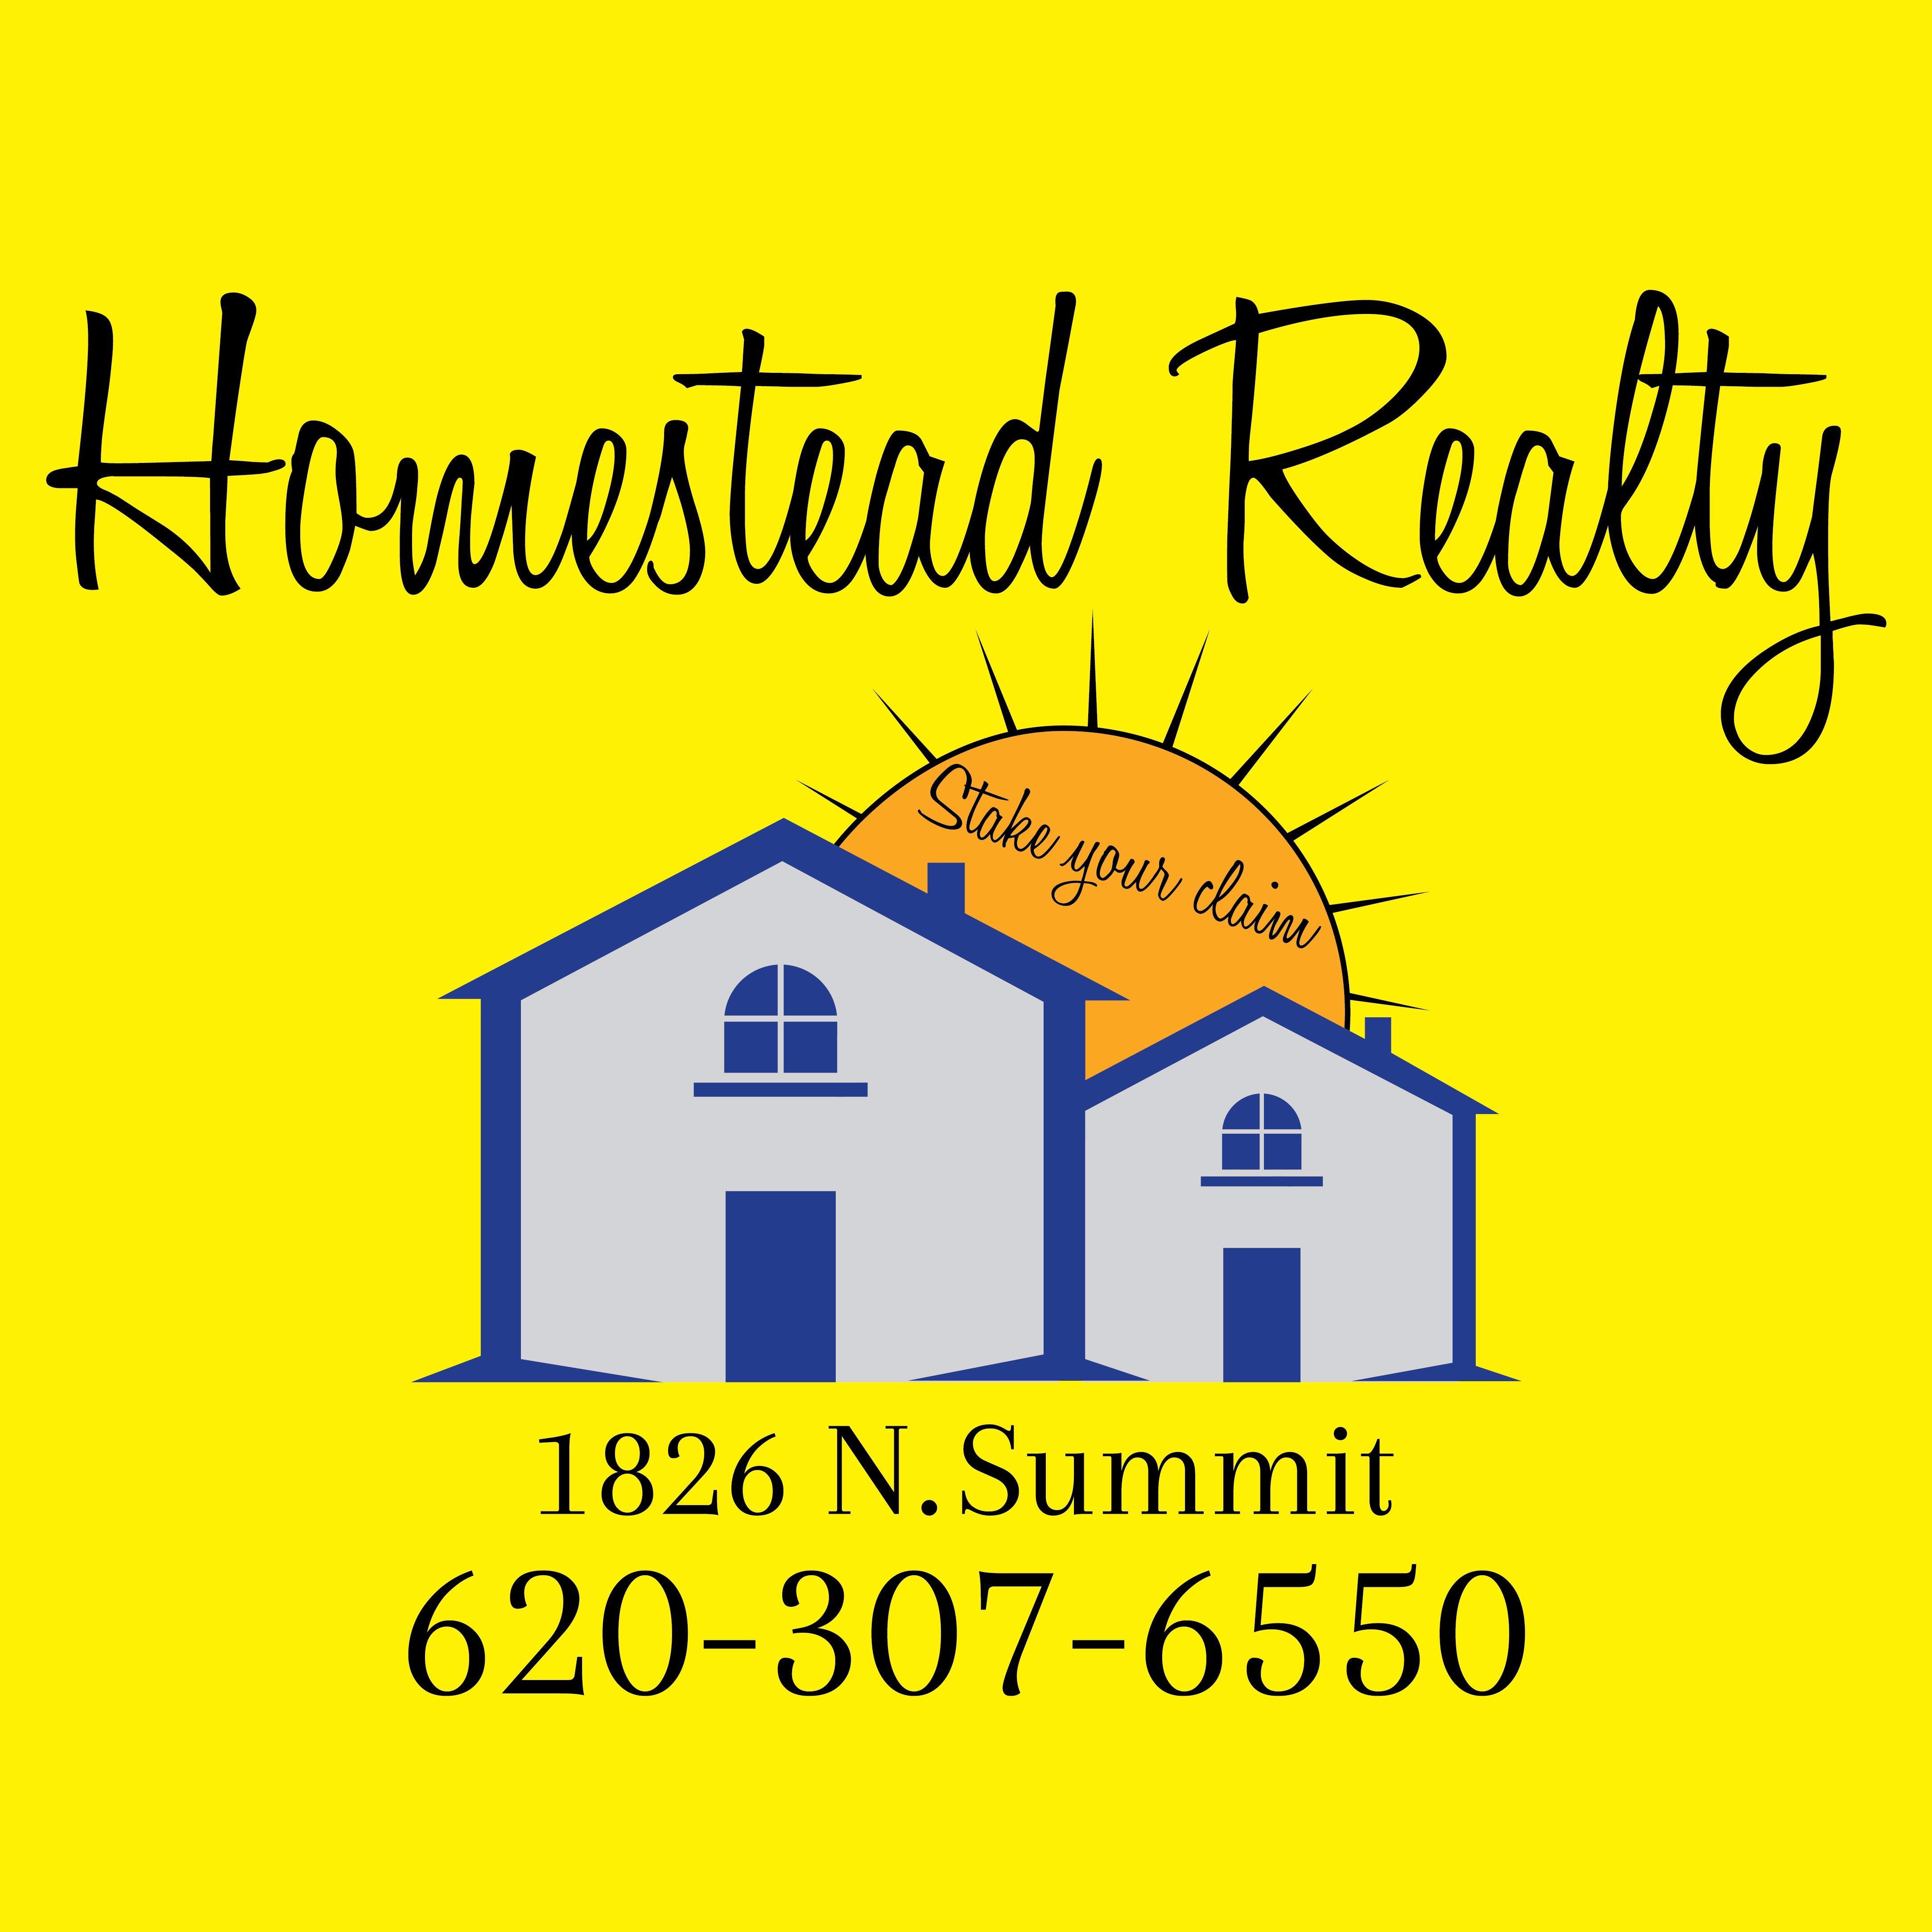 Homestead Realty, LLC - Arkansas City, KS - Real Estate Agents